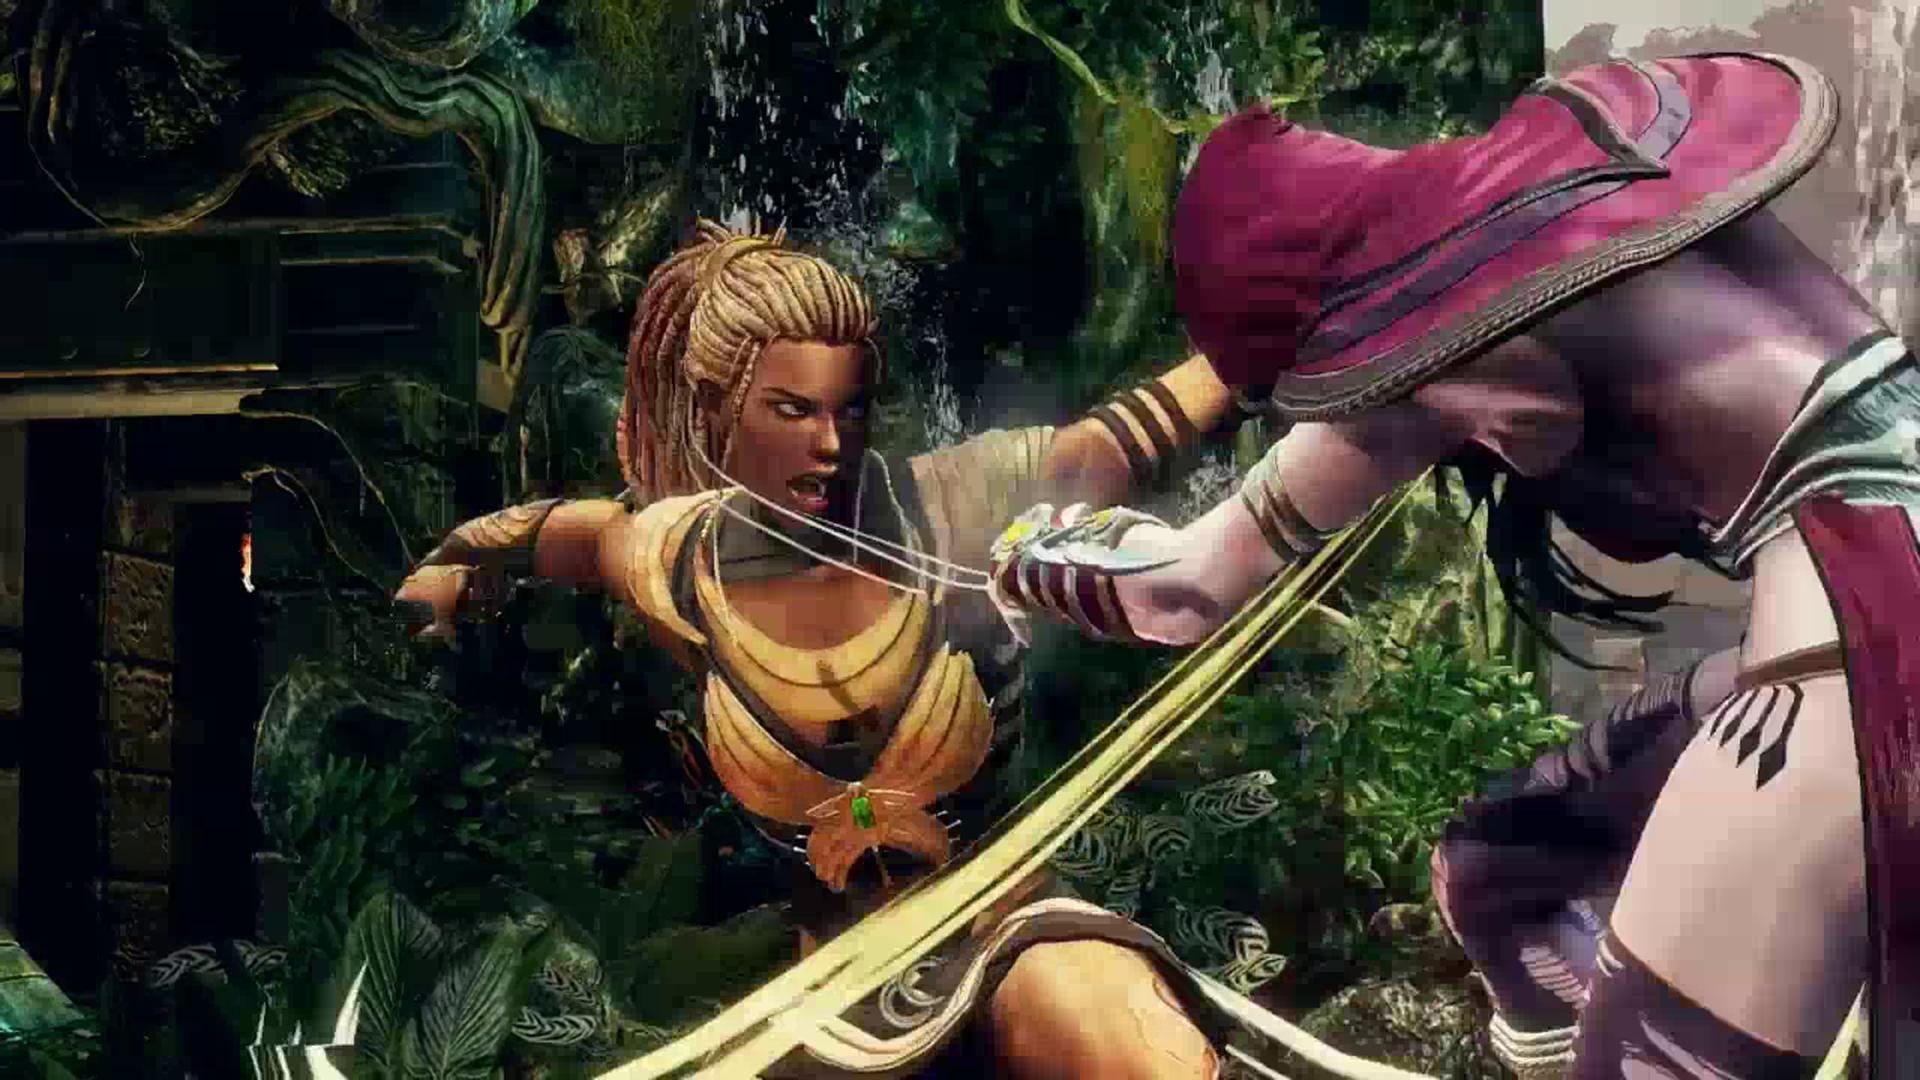 Maya's Endurance